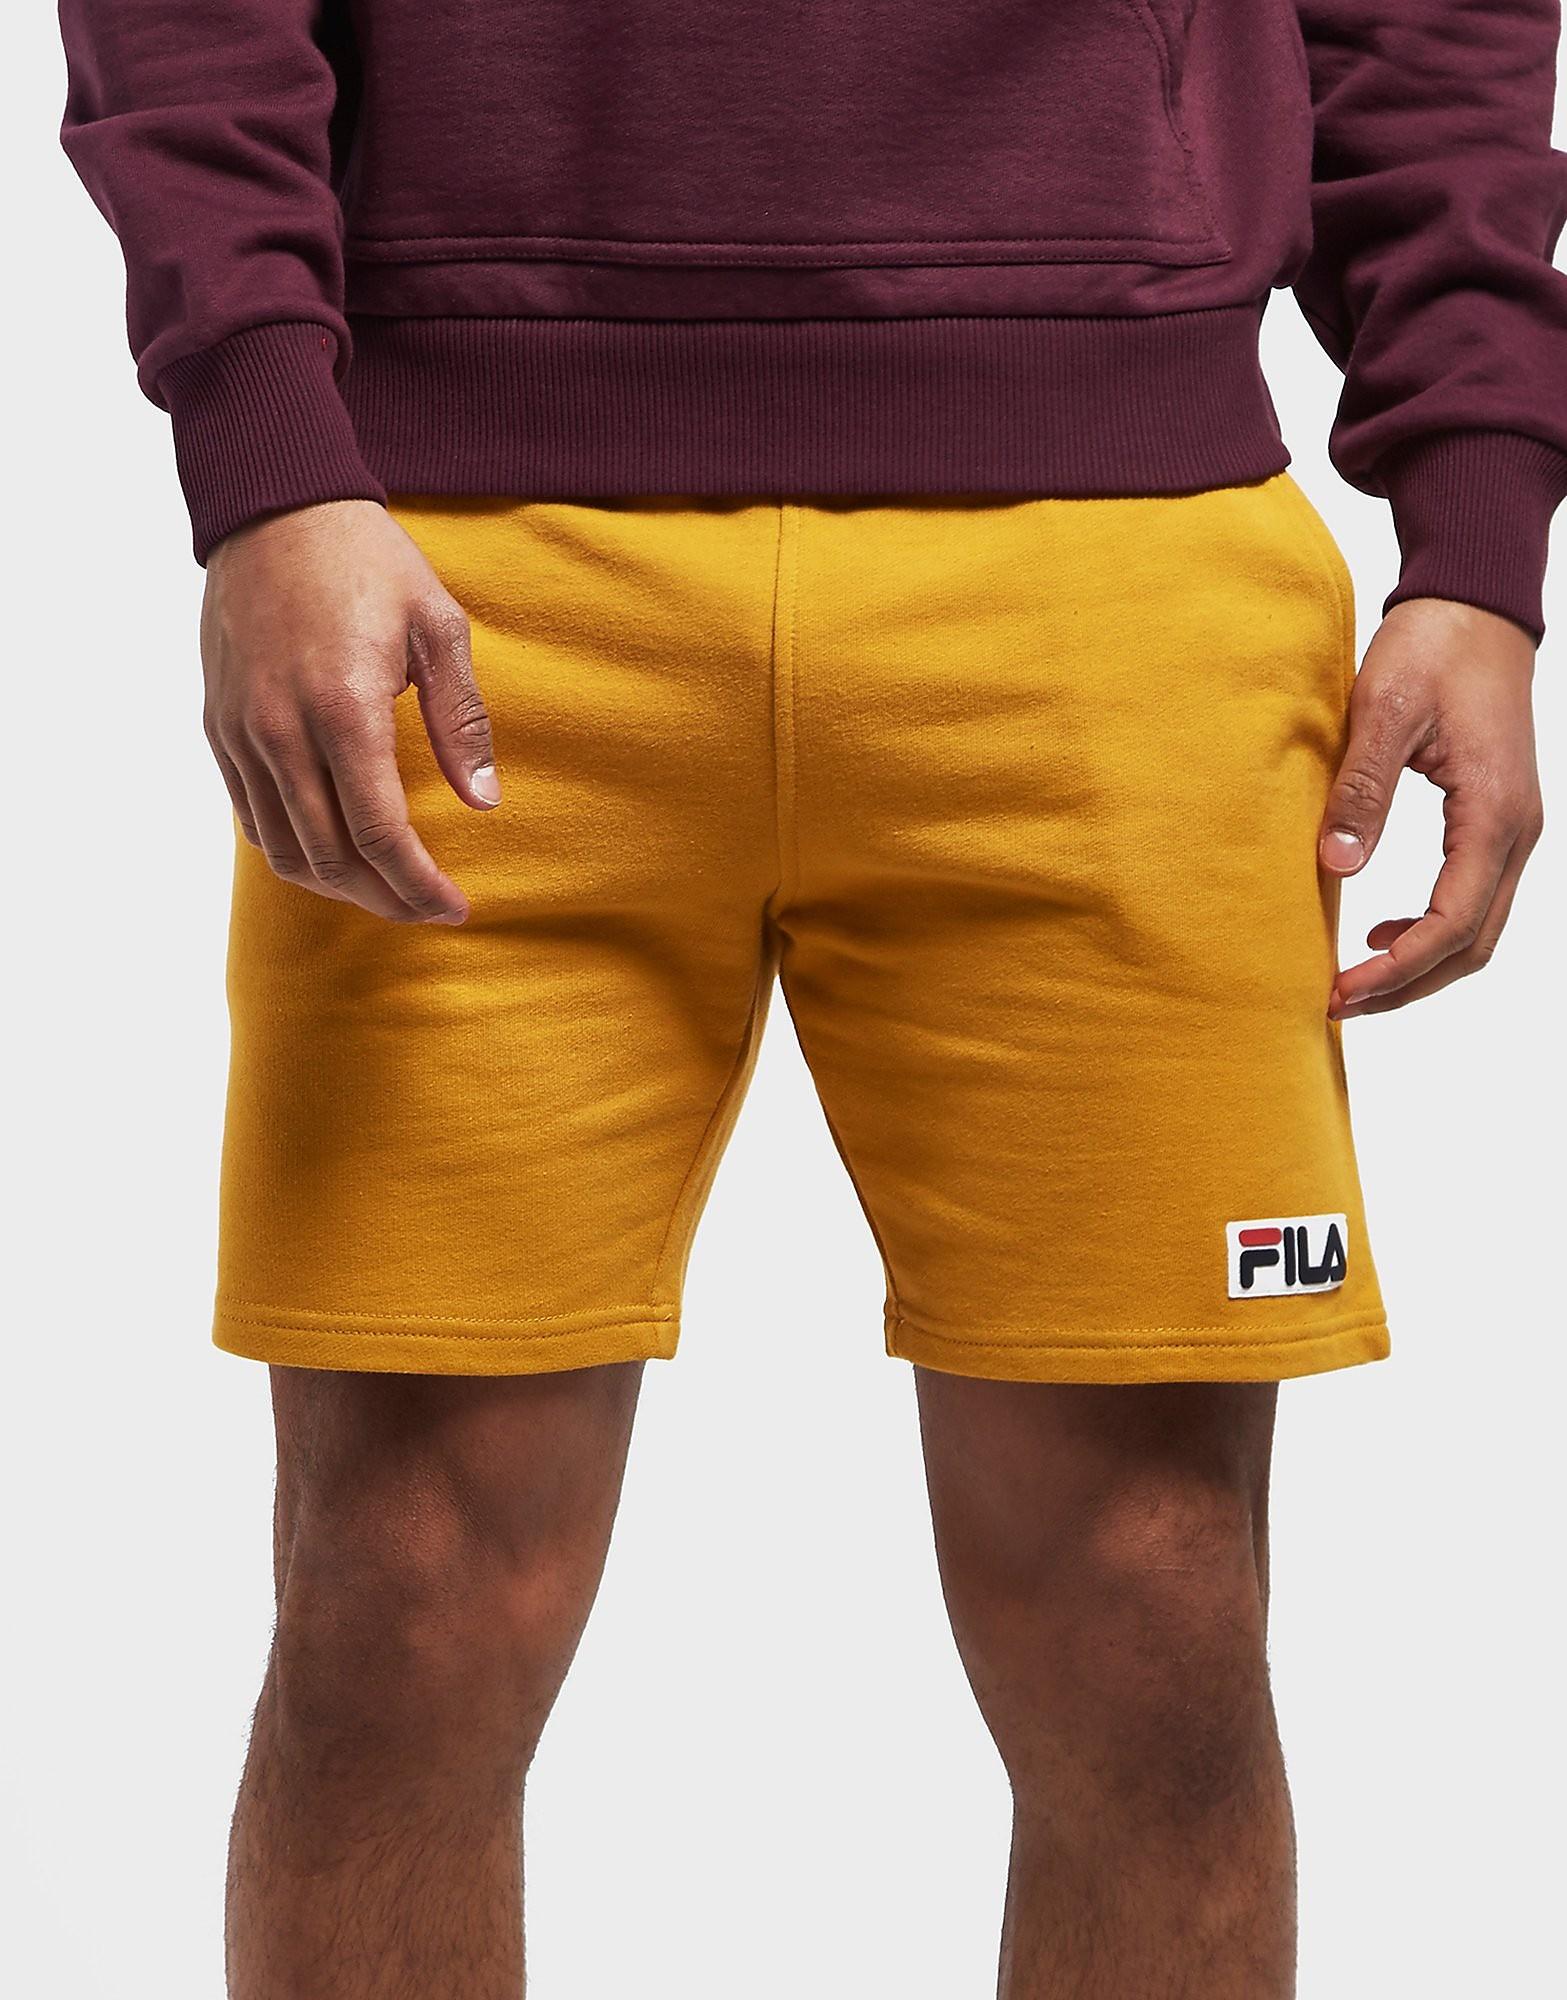 Fila Island Fleece Shorts